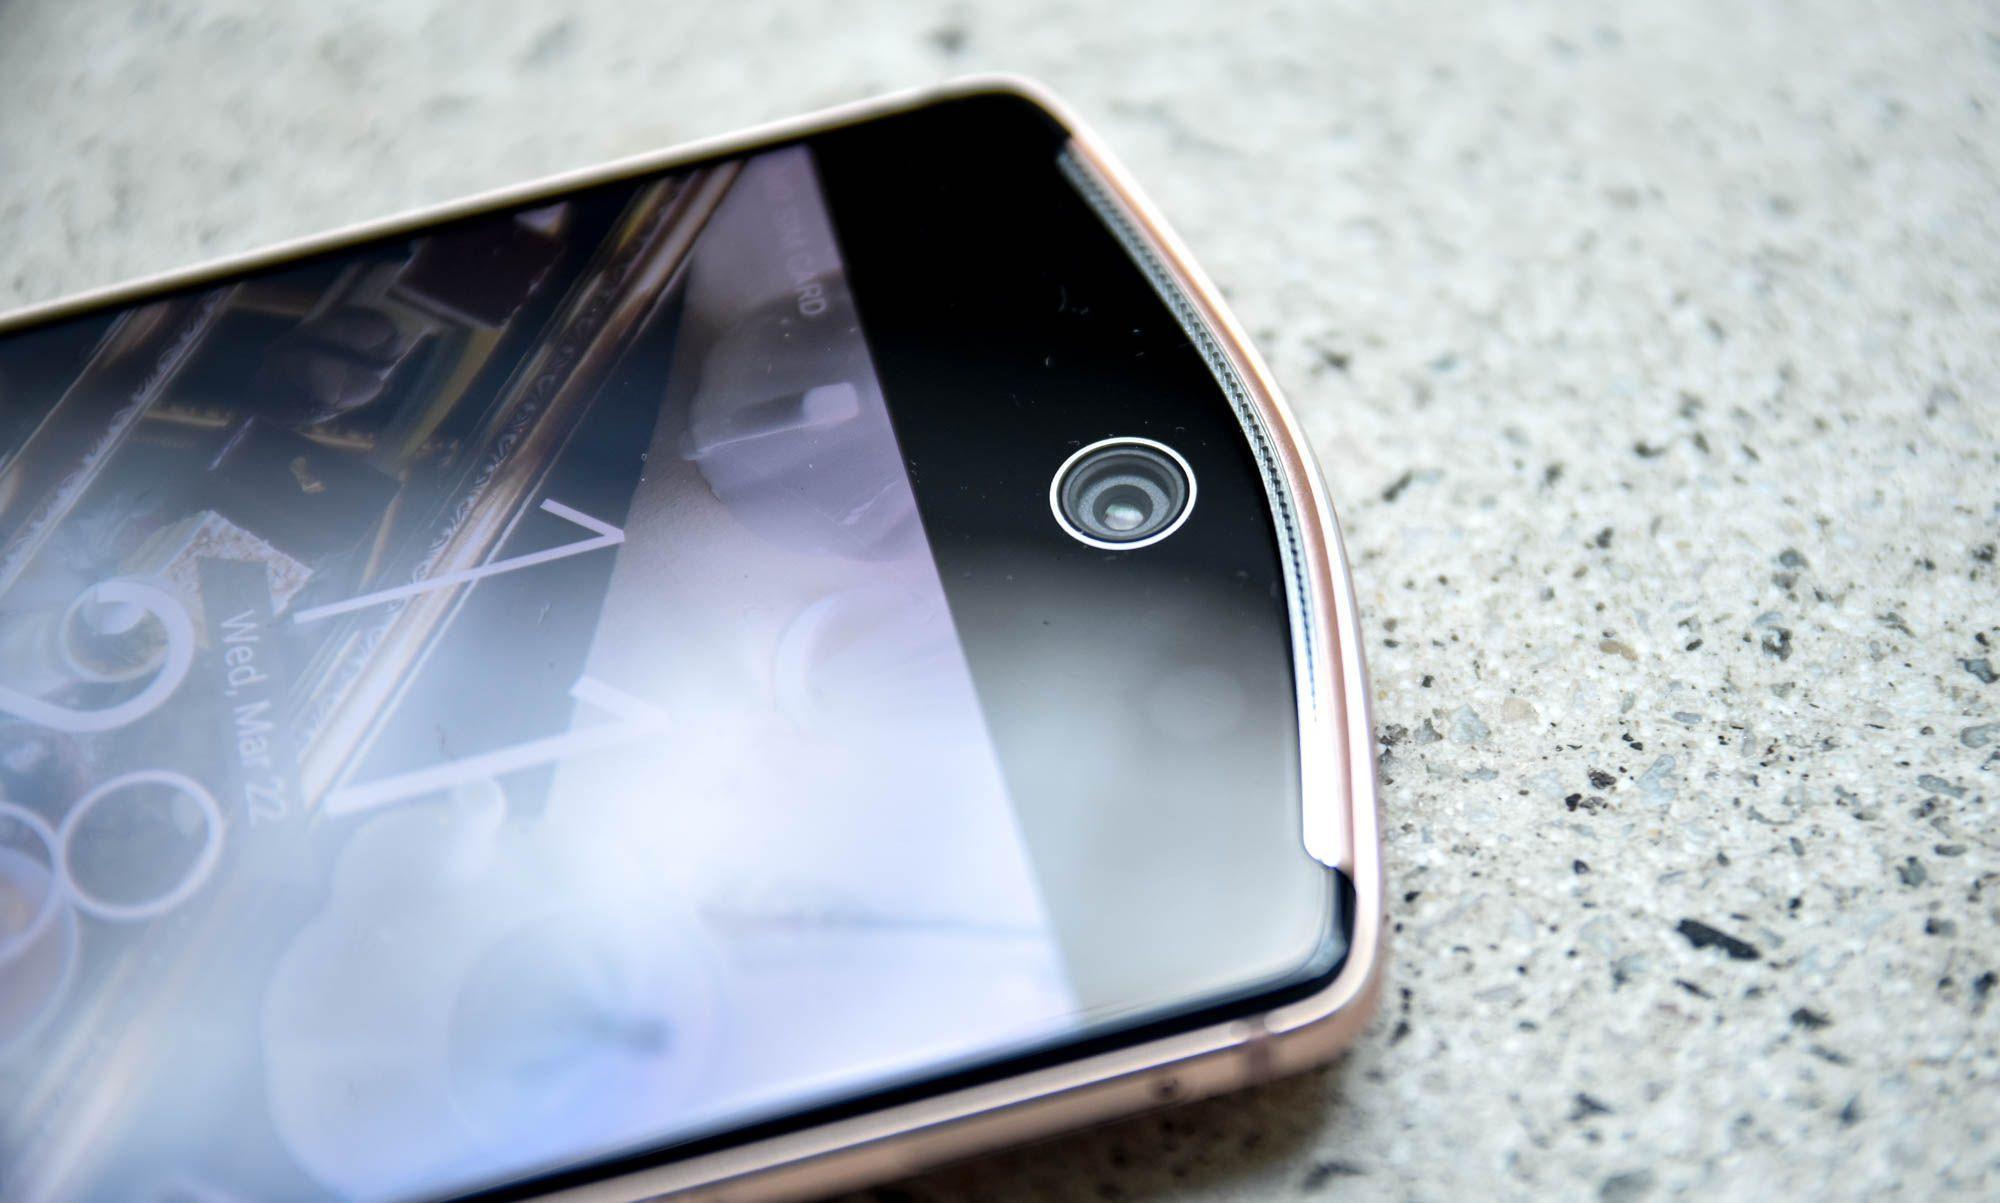 The Meitu T8 is a selfie-lover's dream phone